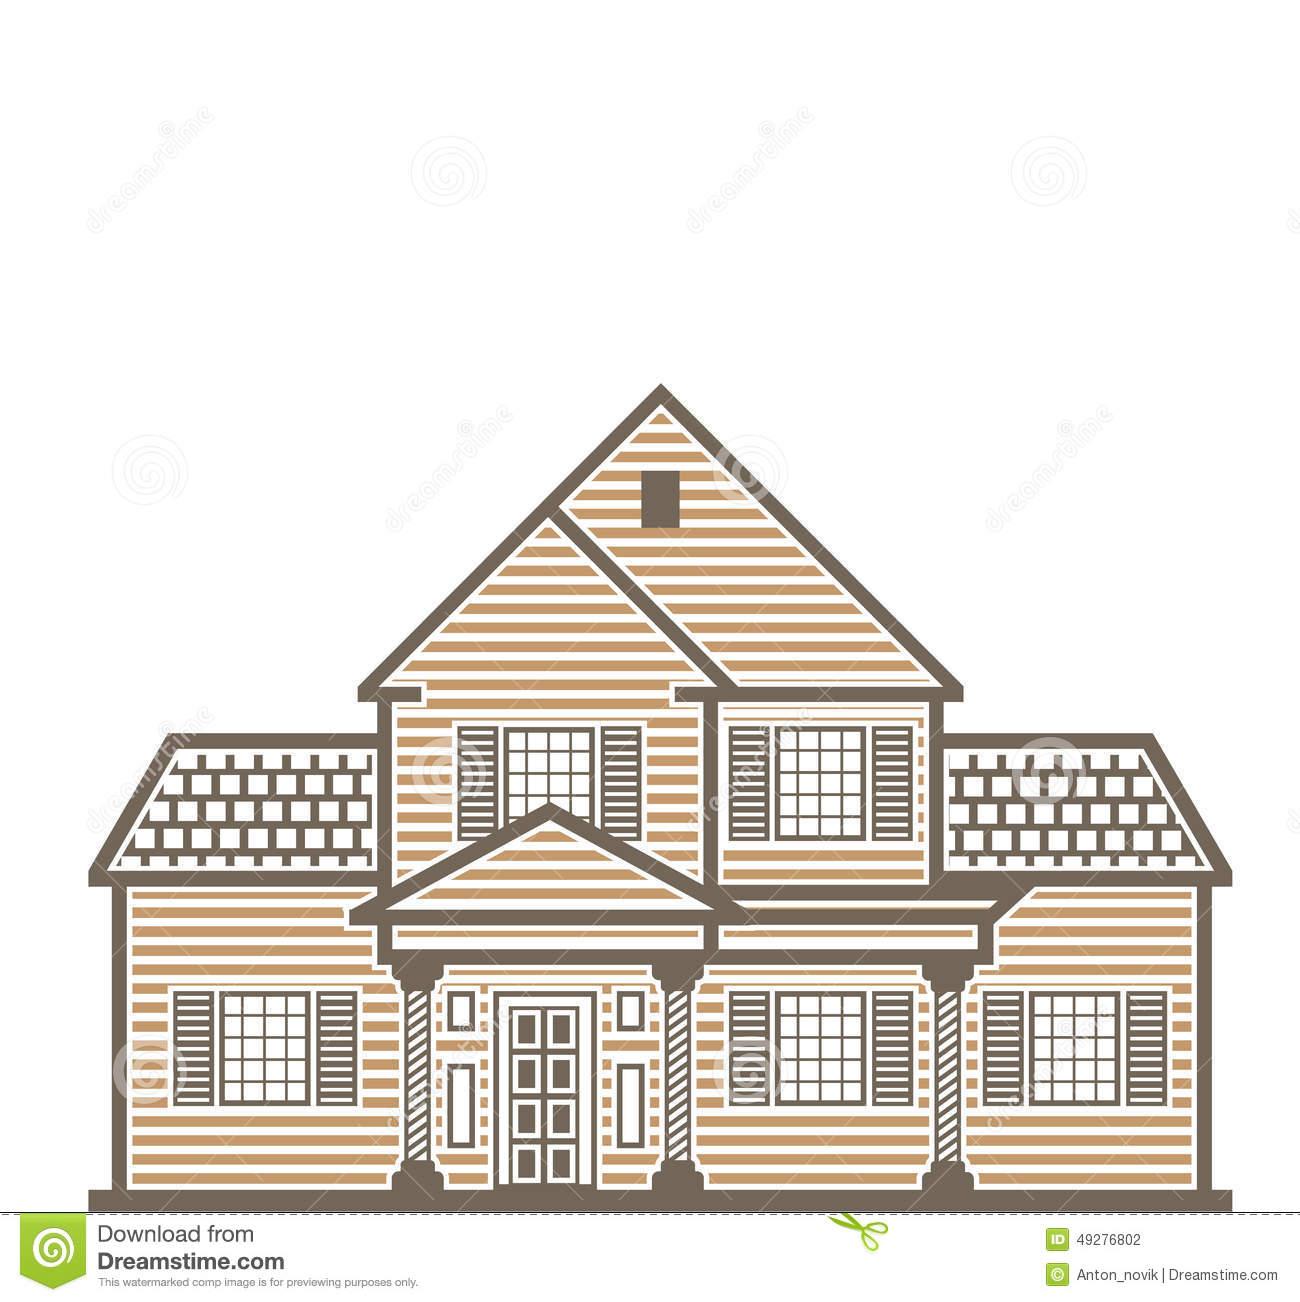 Single Family House Vector Stock Vector.